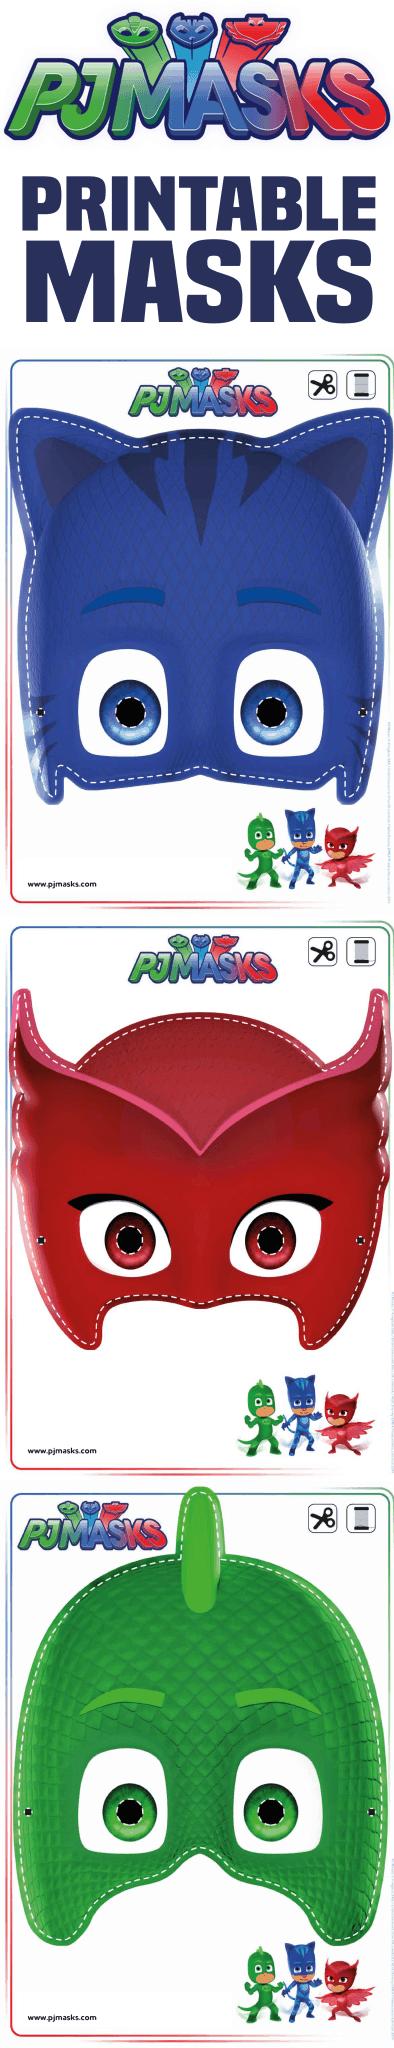 printables pj masks owlette gekko catboy masks life she has